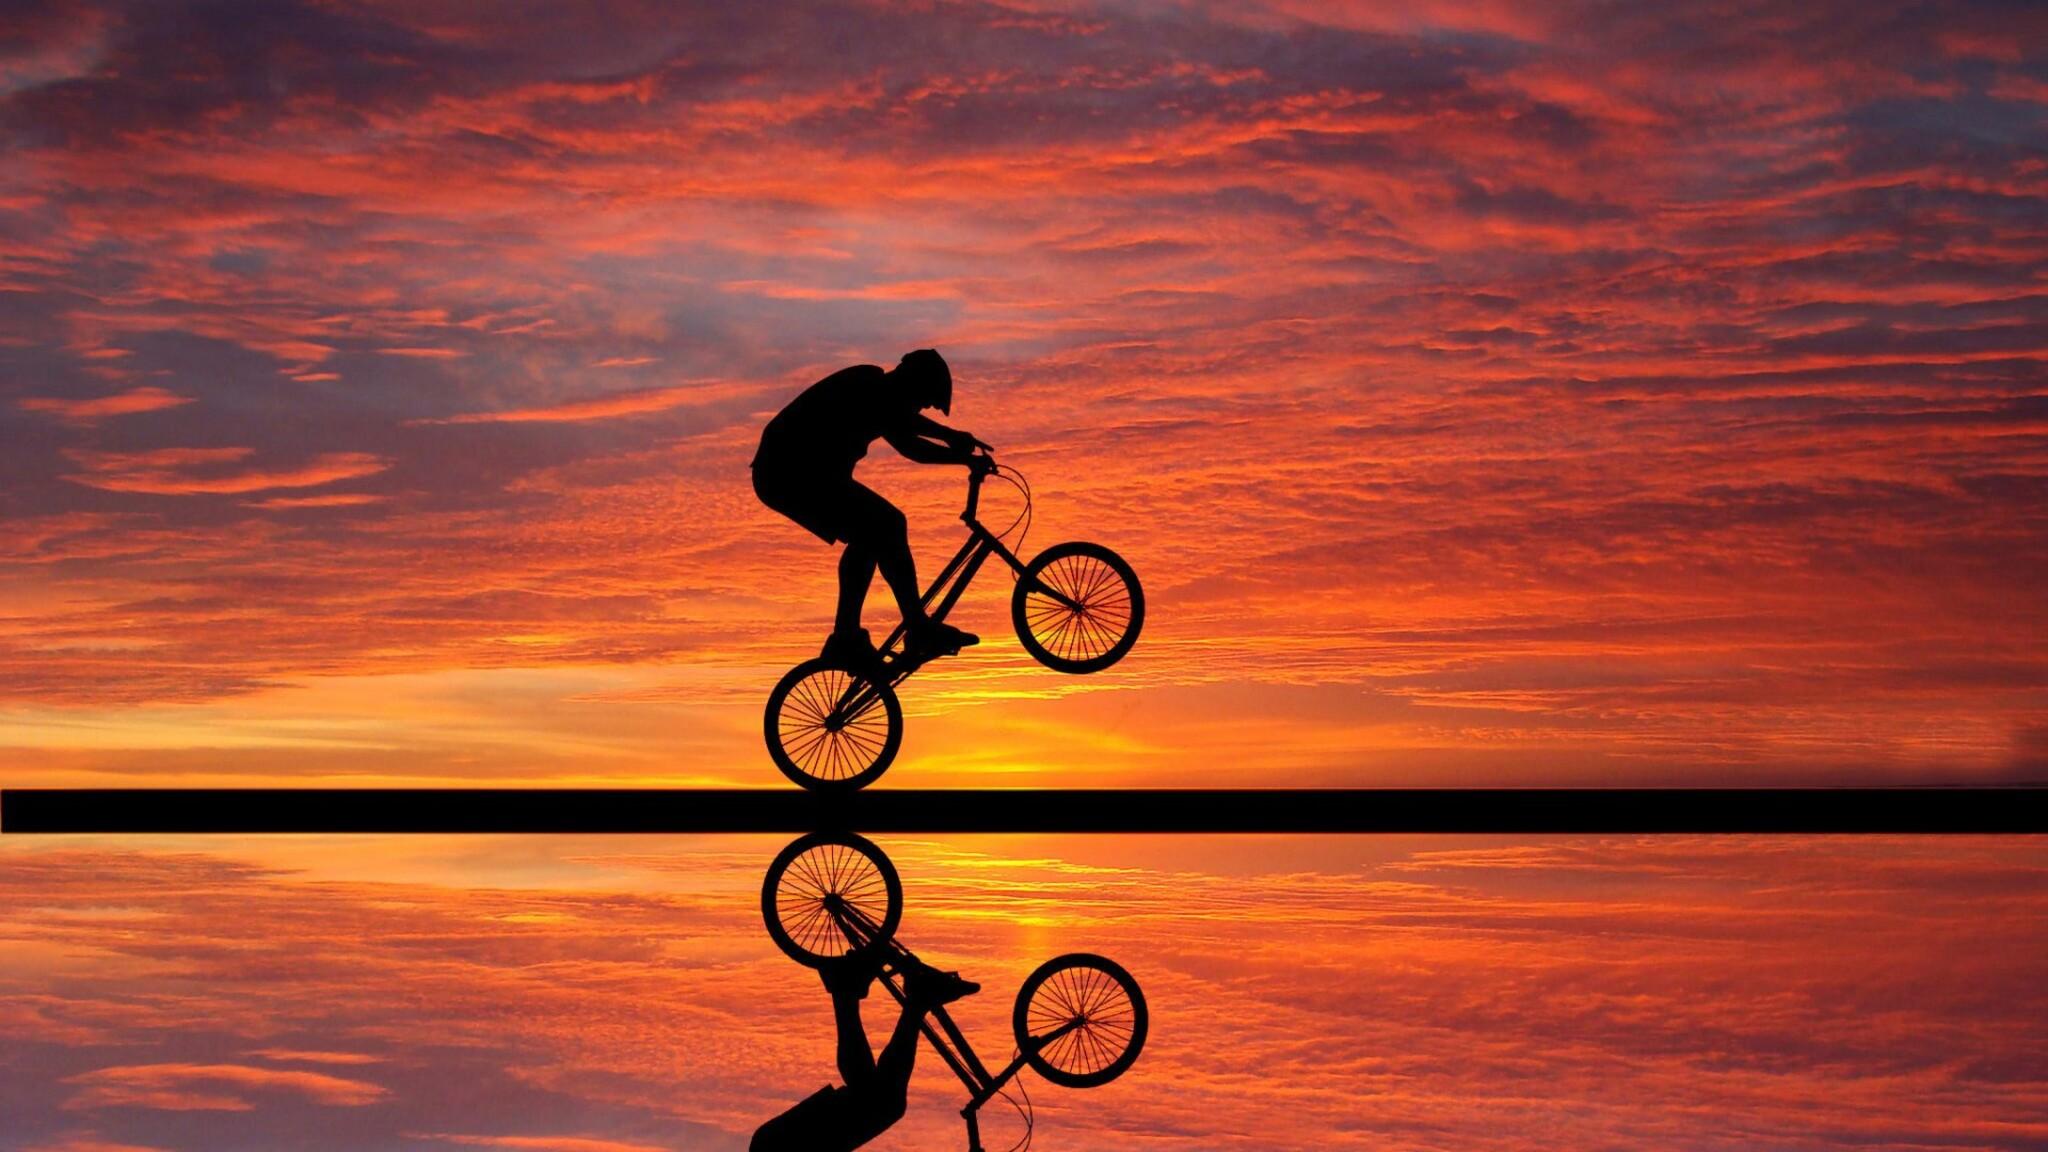 2048x1152 Cycling Sunset 2048x1152 Resolution Hd 4k